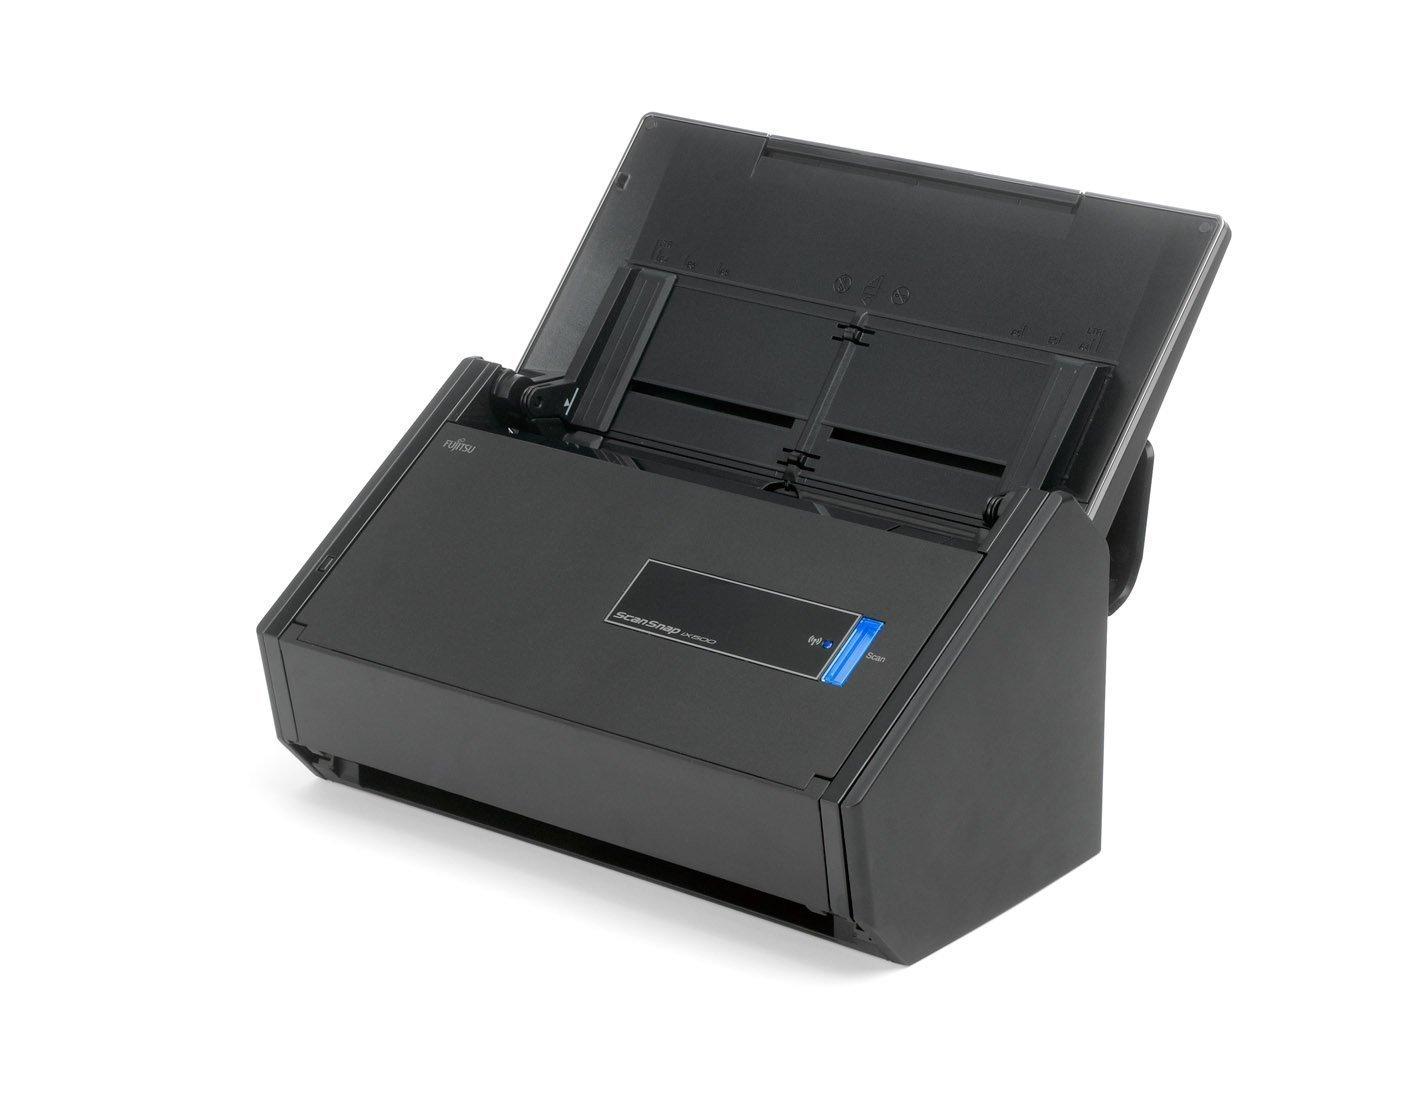 FUJITSU Document Scanner ScanSnap iX500